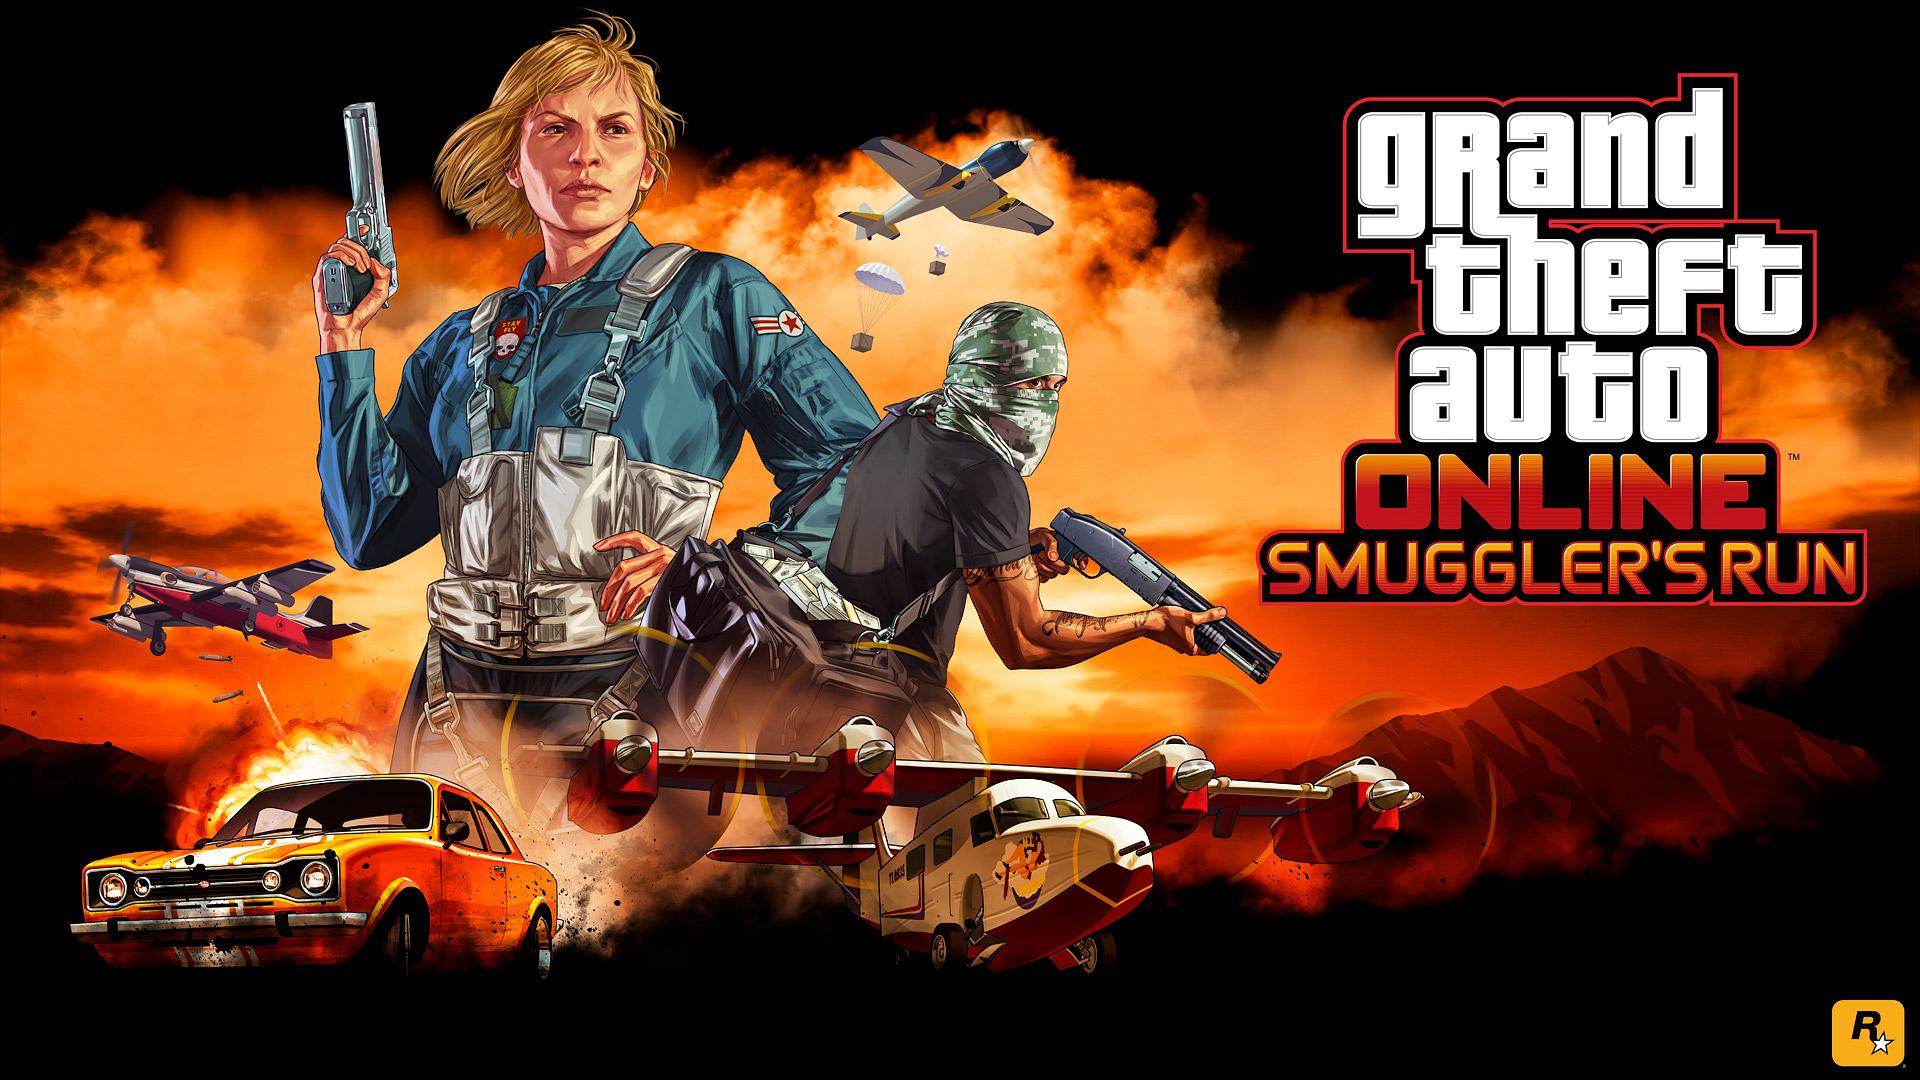 Next Up in GTA Online: Smuggler's Run – Watch the Trailer - Rockstar Games